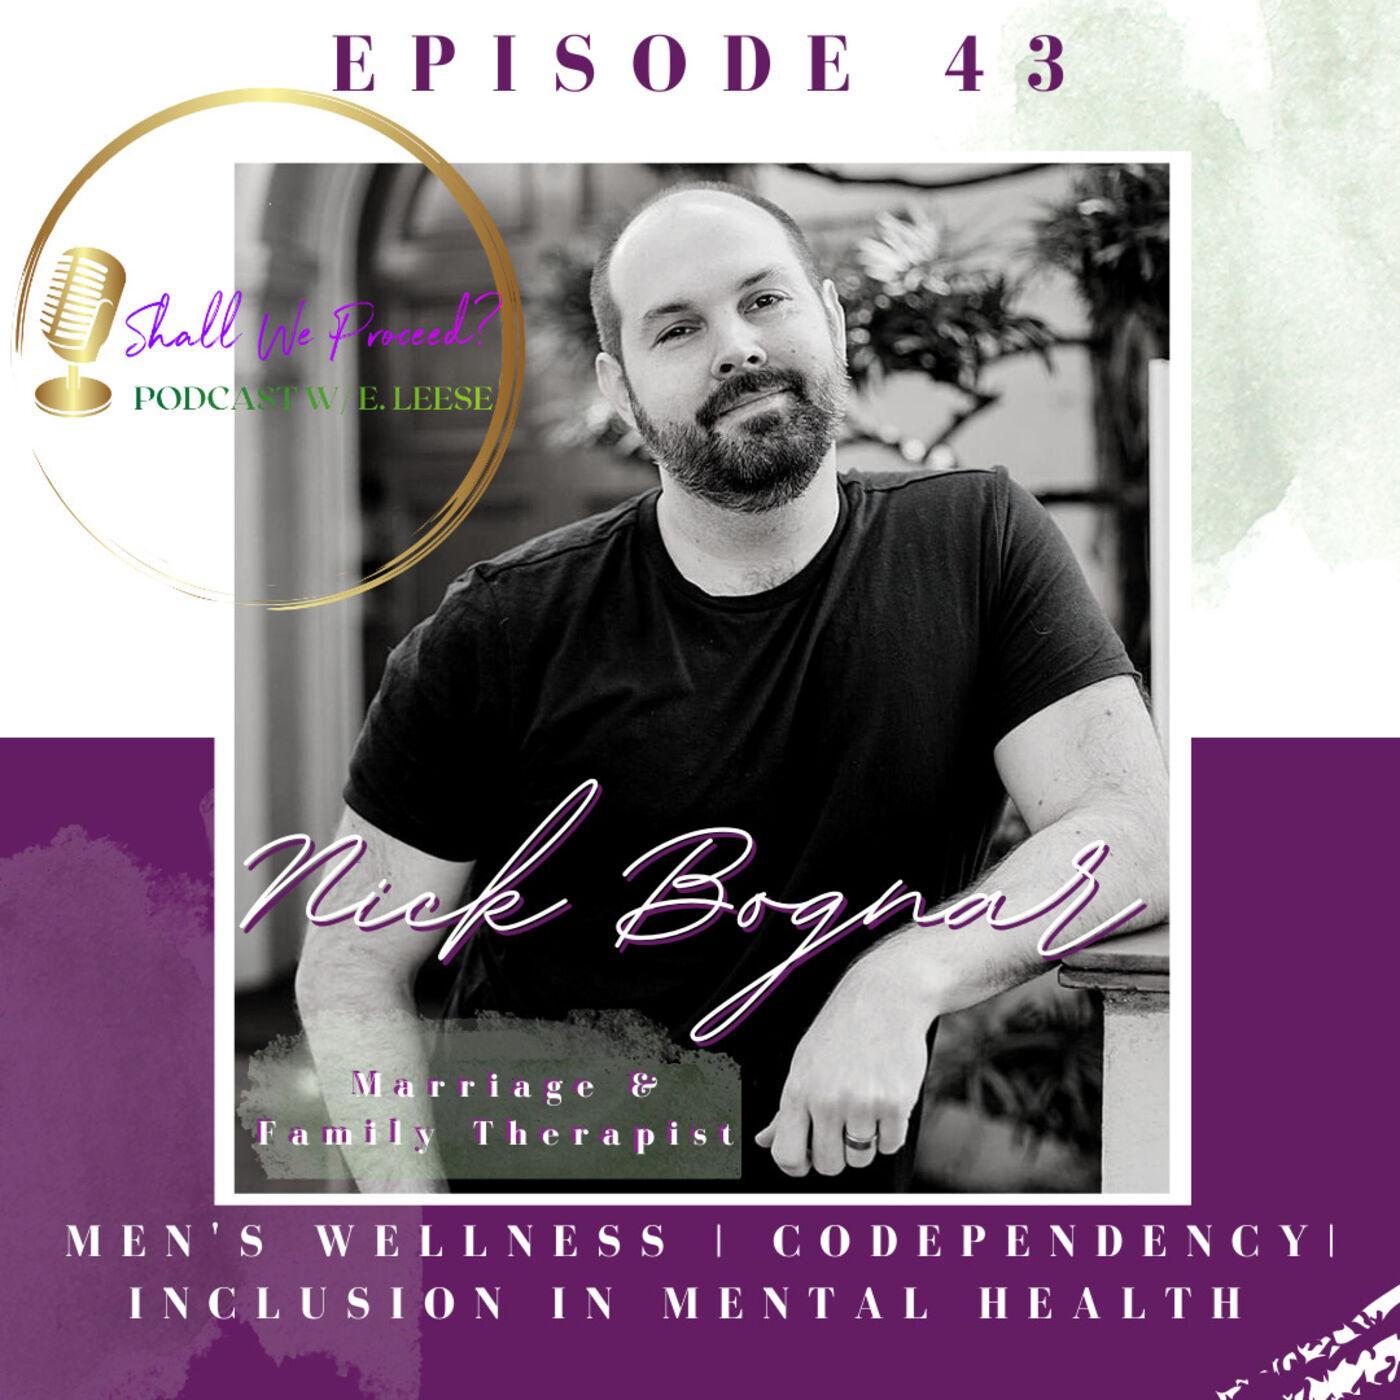 Men's Wellness, Codependency, & Inclusion in Mental Wellness w/ Nick Bognar, MFT